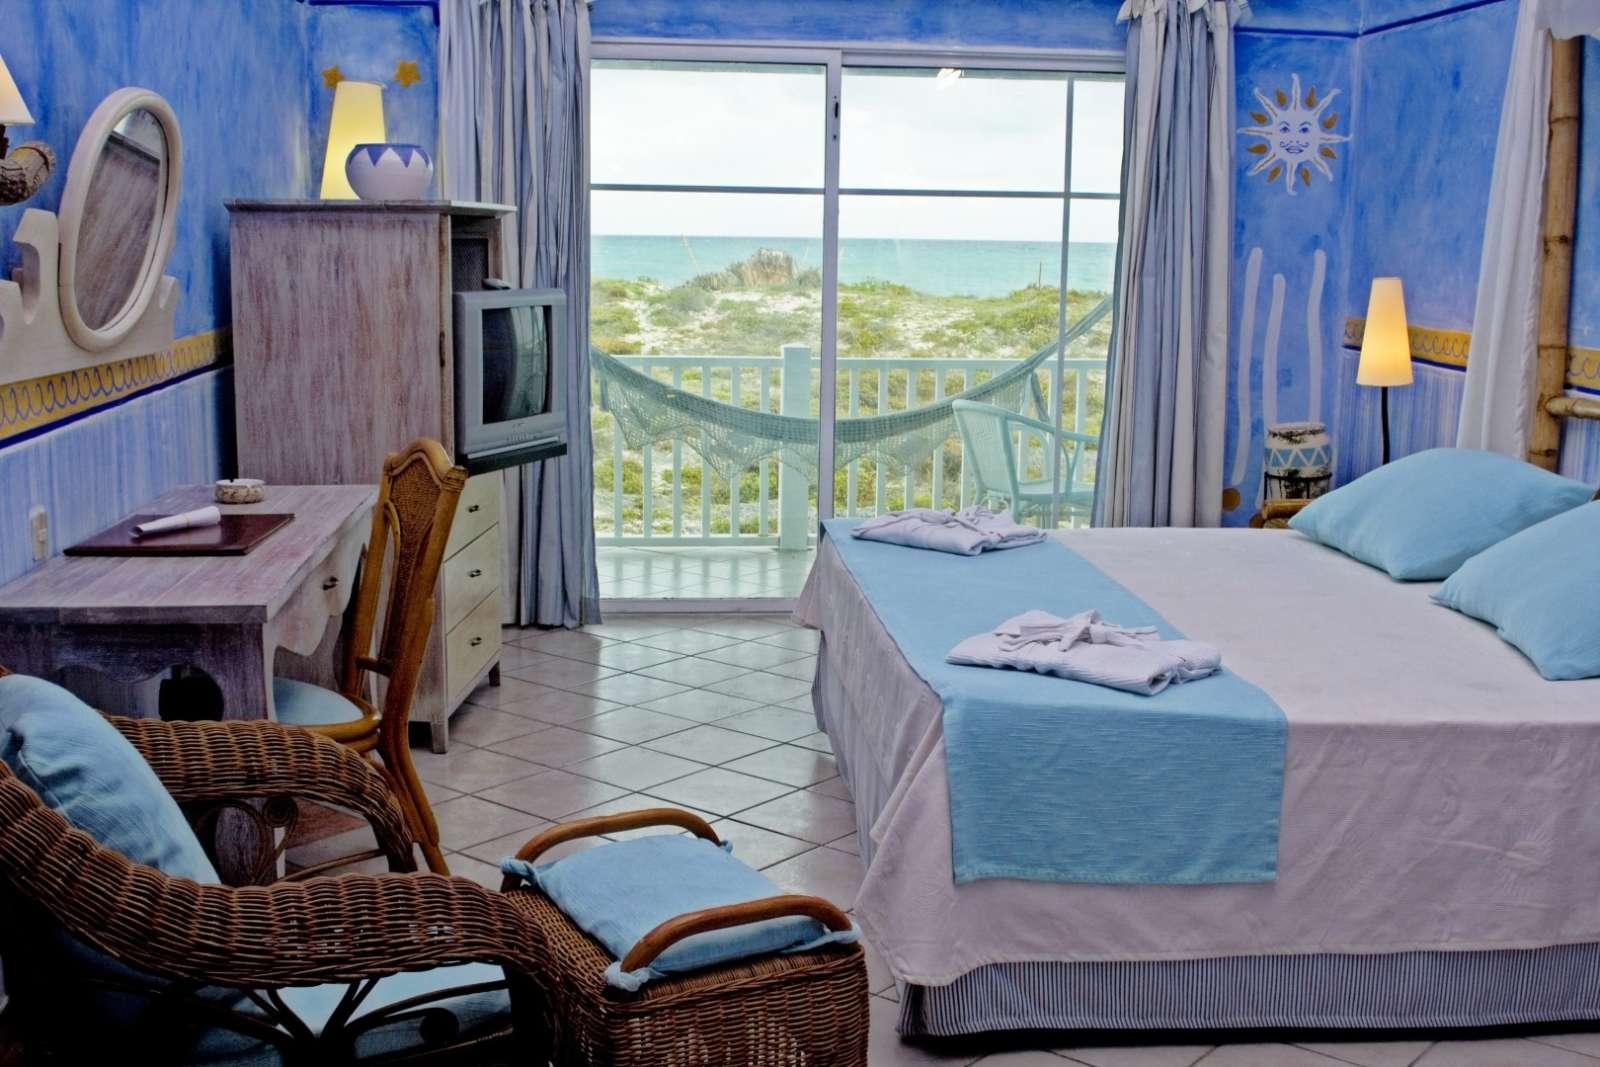 Seaview room at Sol Cayo Largo